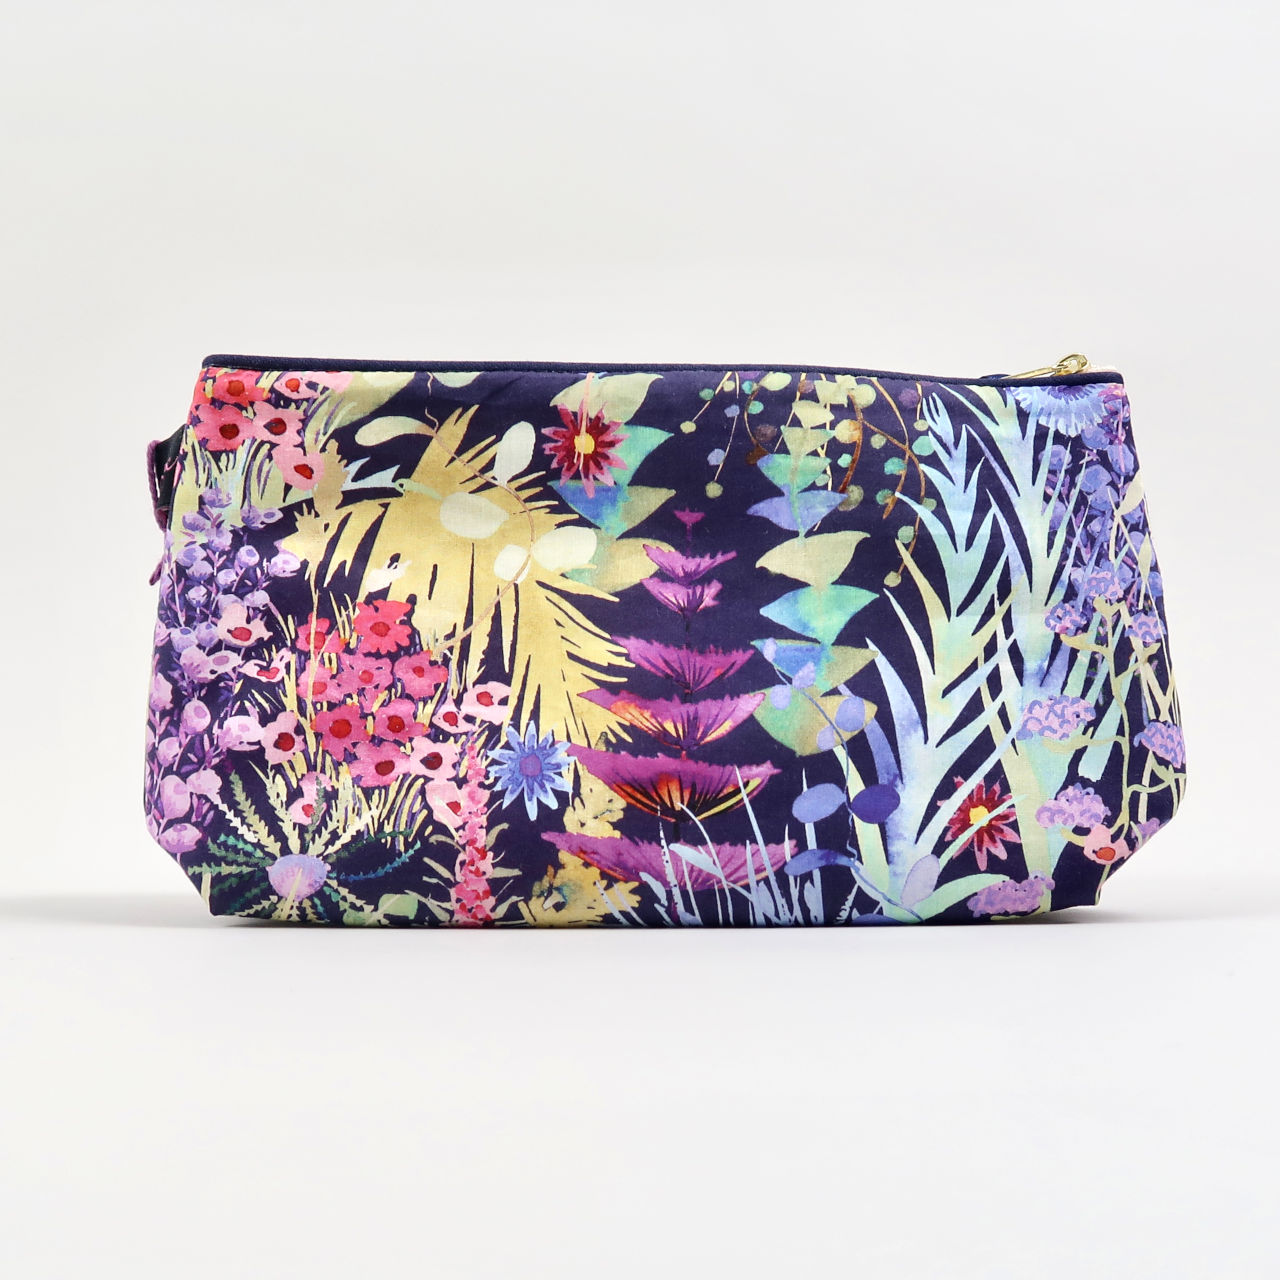 Liberty Print Cosmetic Bag - Tresco Evening